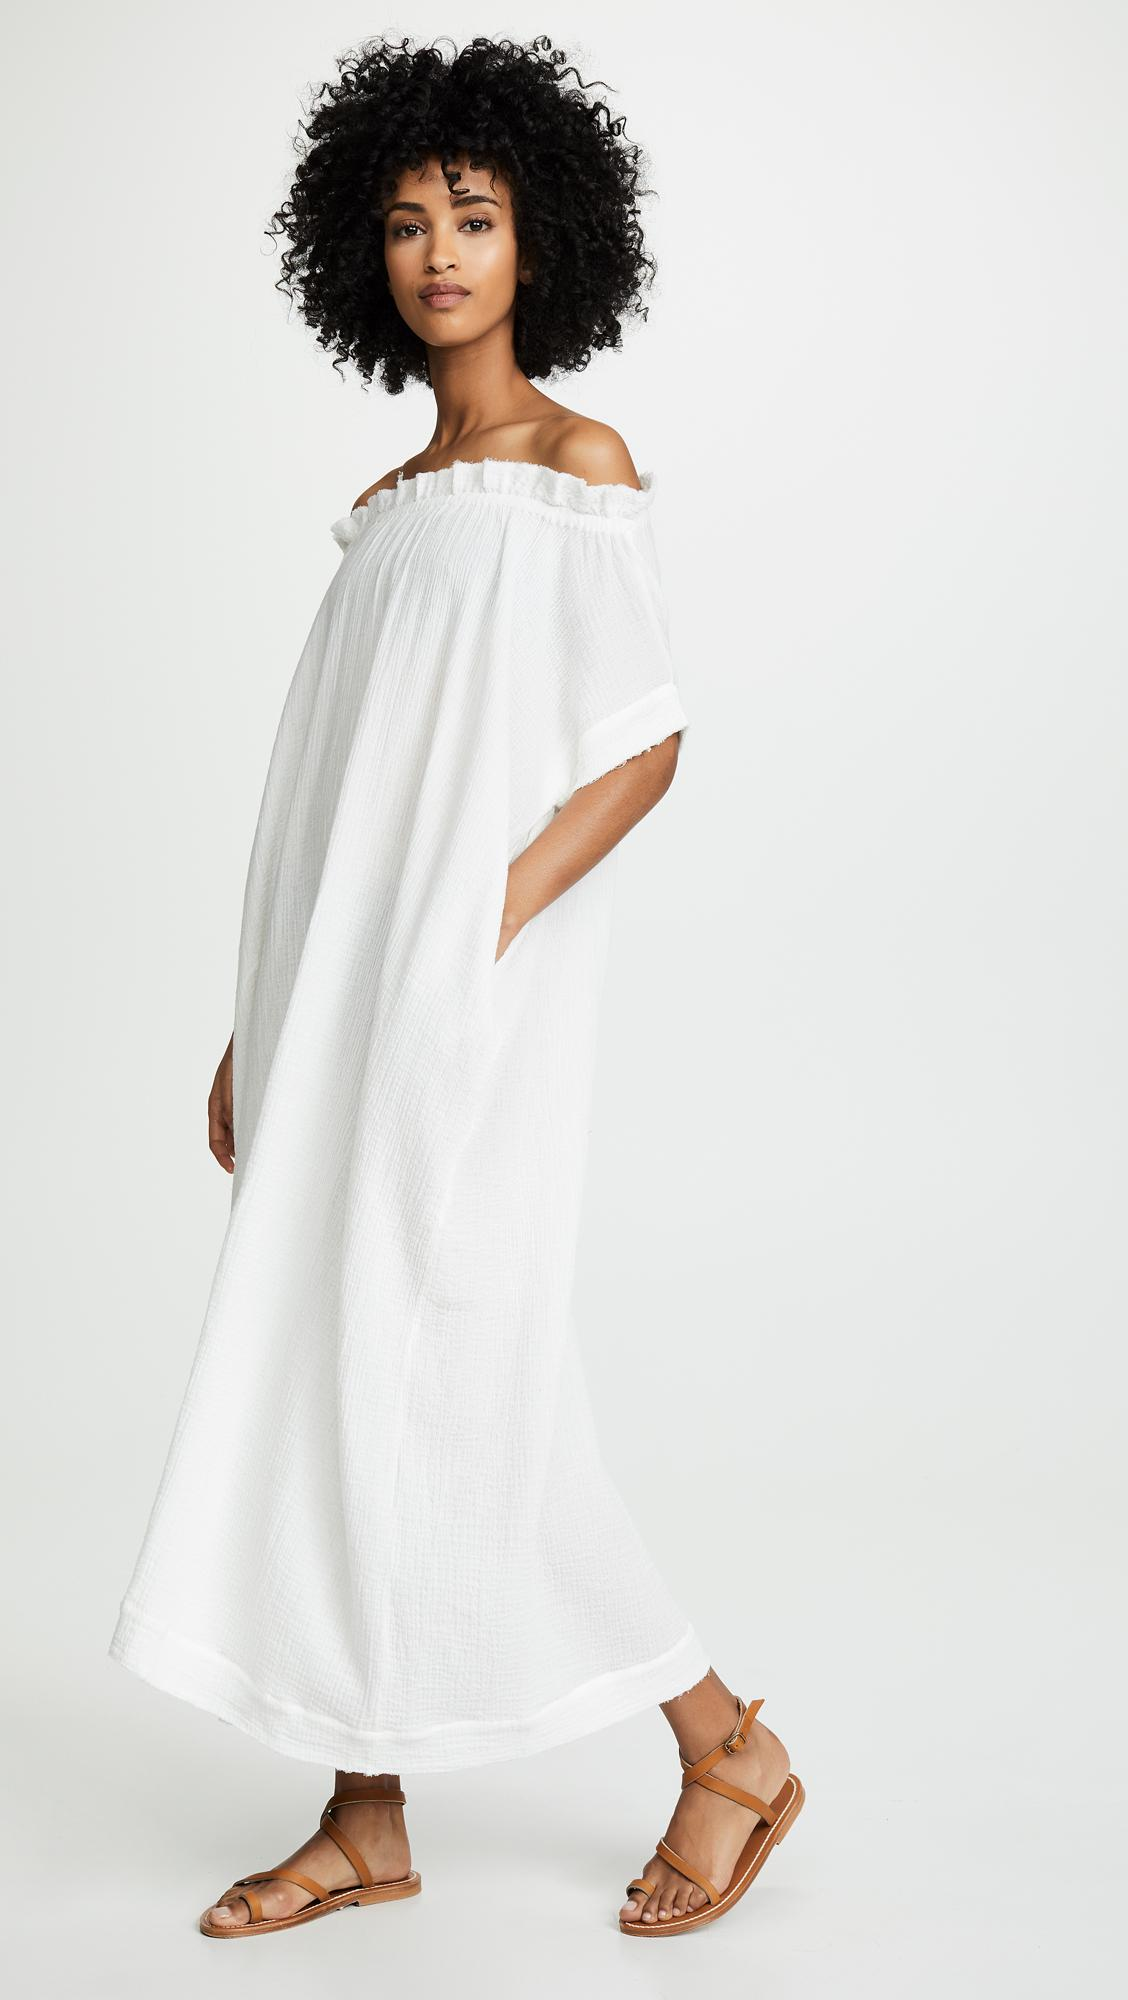 7f8010941c Mikoh Swimwear Mirakami Dress in White - Lyst